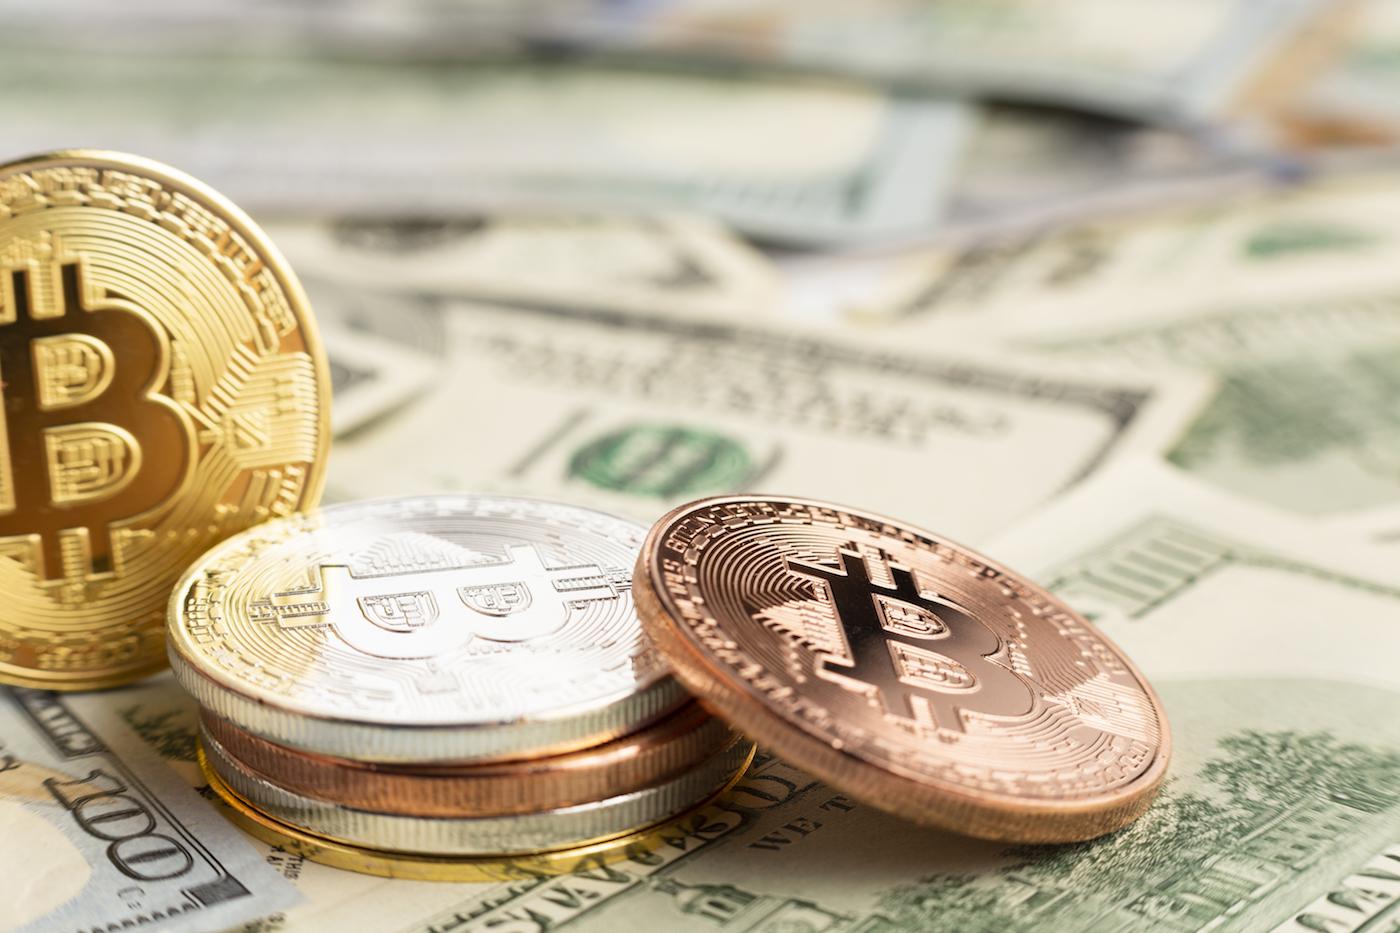 bitcoin dolari yener mi